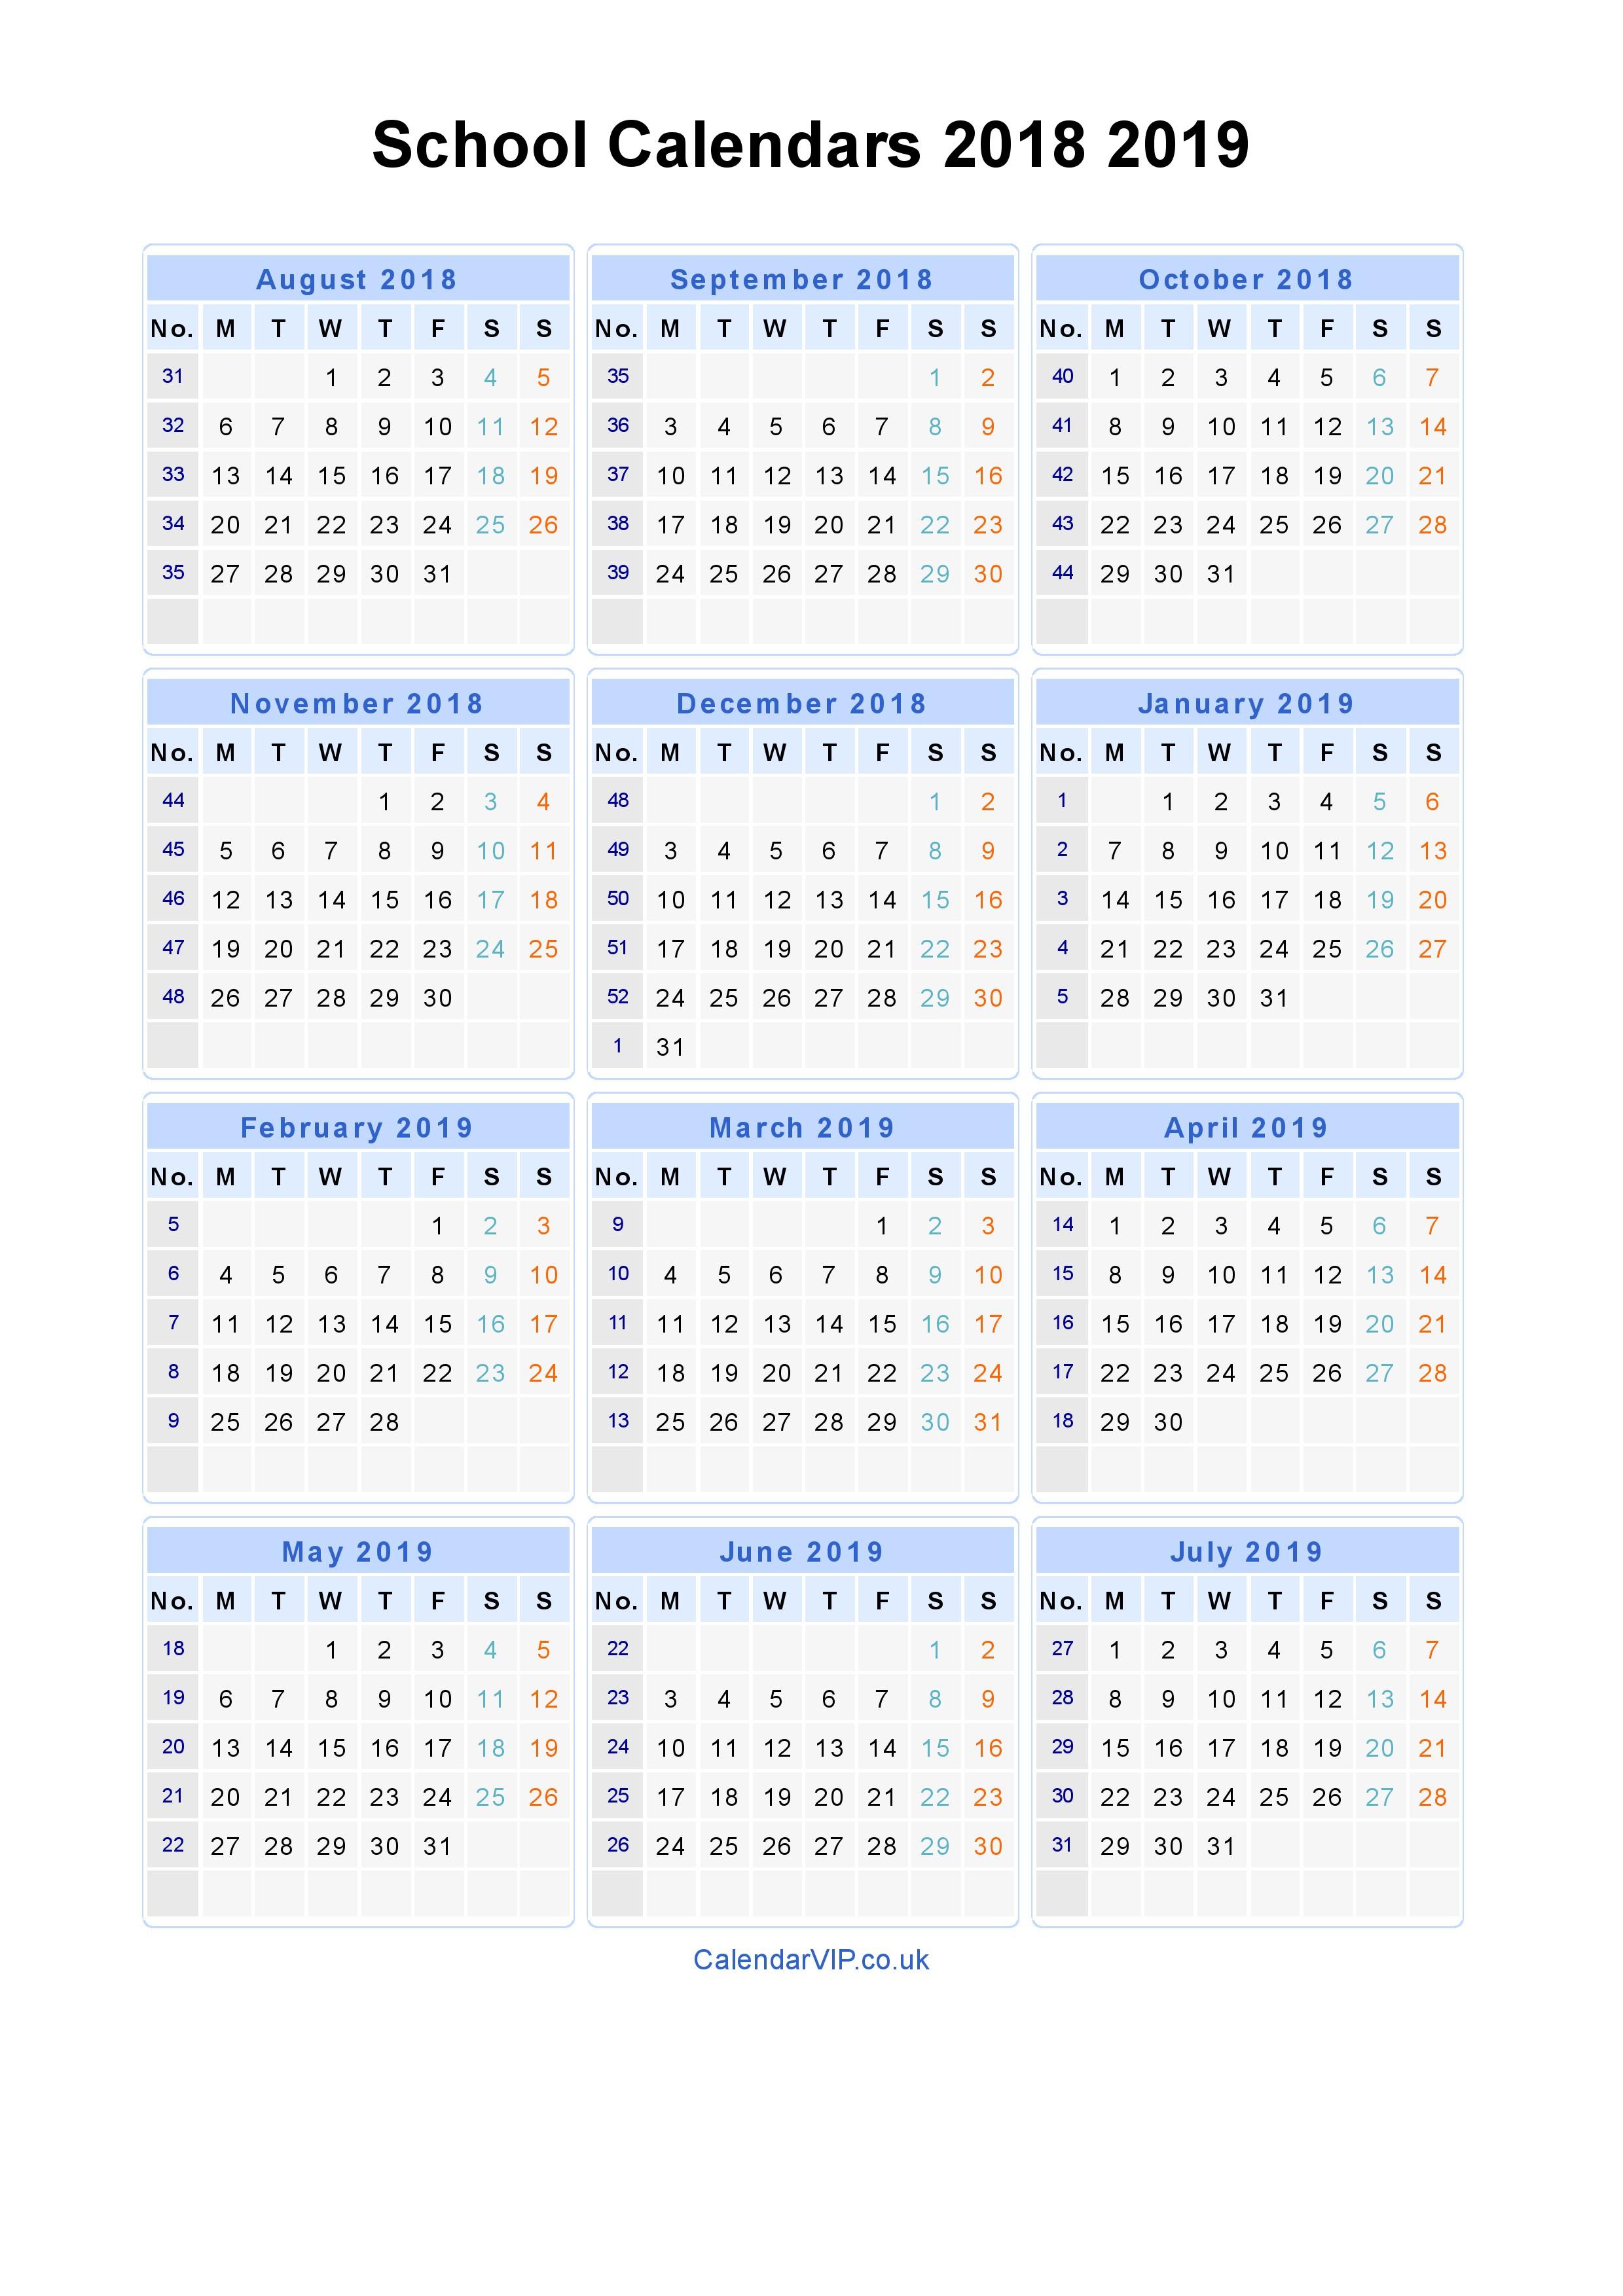 School Calendars 2018 2019 - Calendar From August 2018 To July 2019 inside Calendar Blank Planner Months 18 School Year